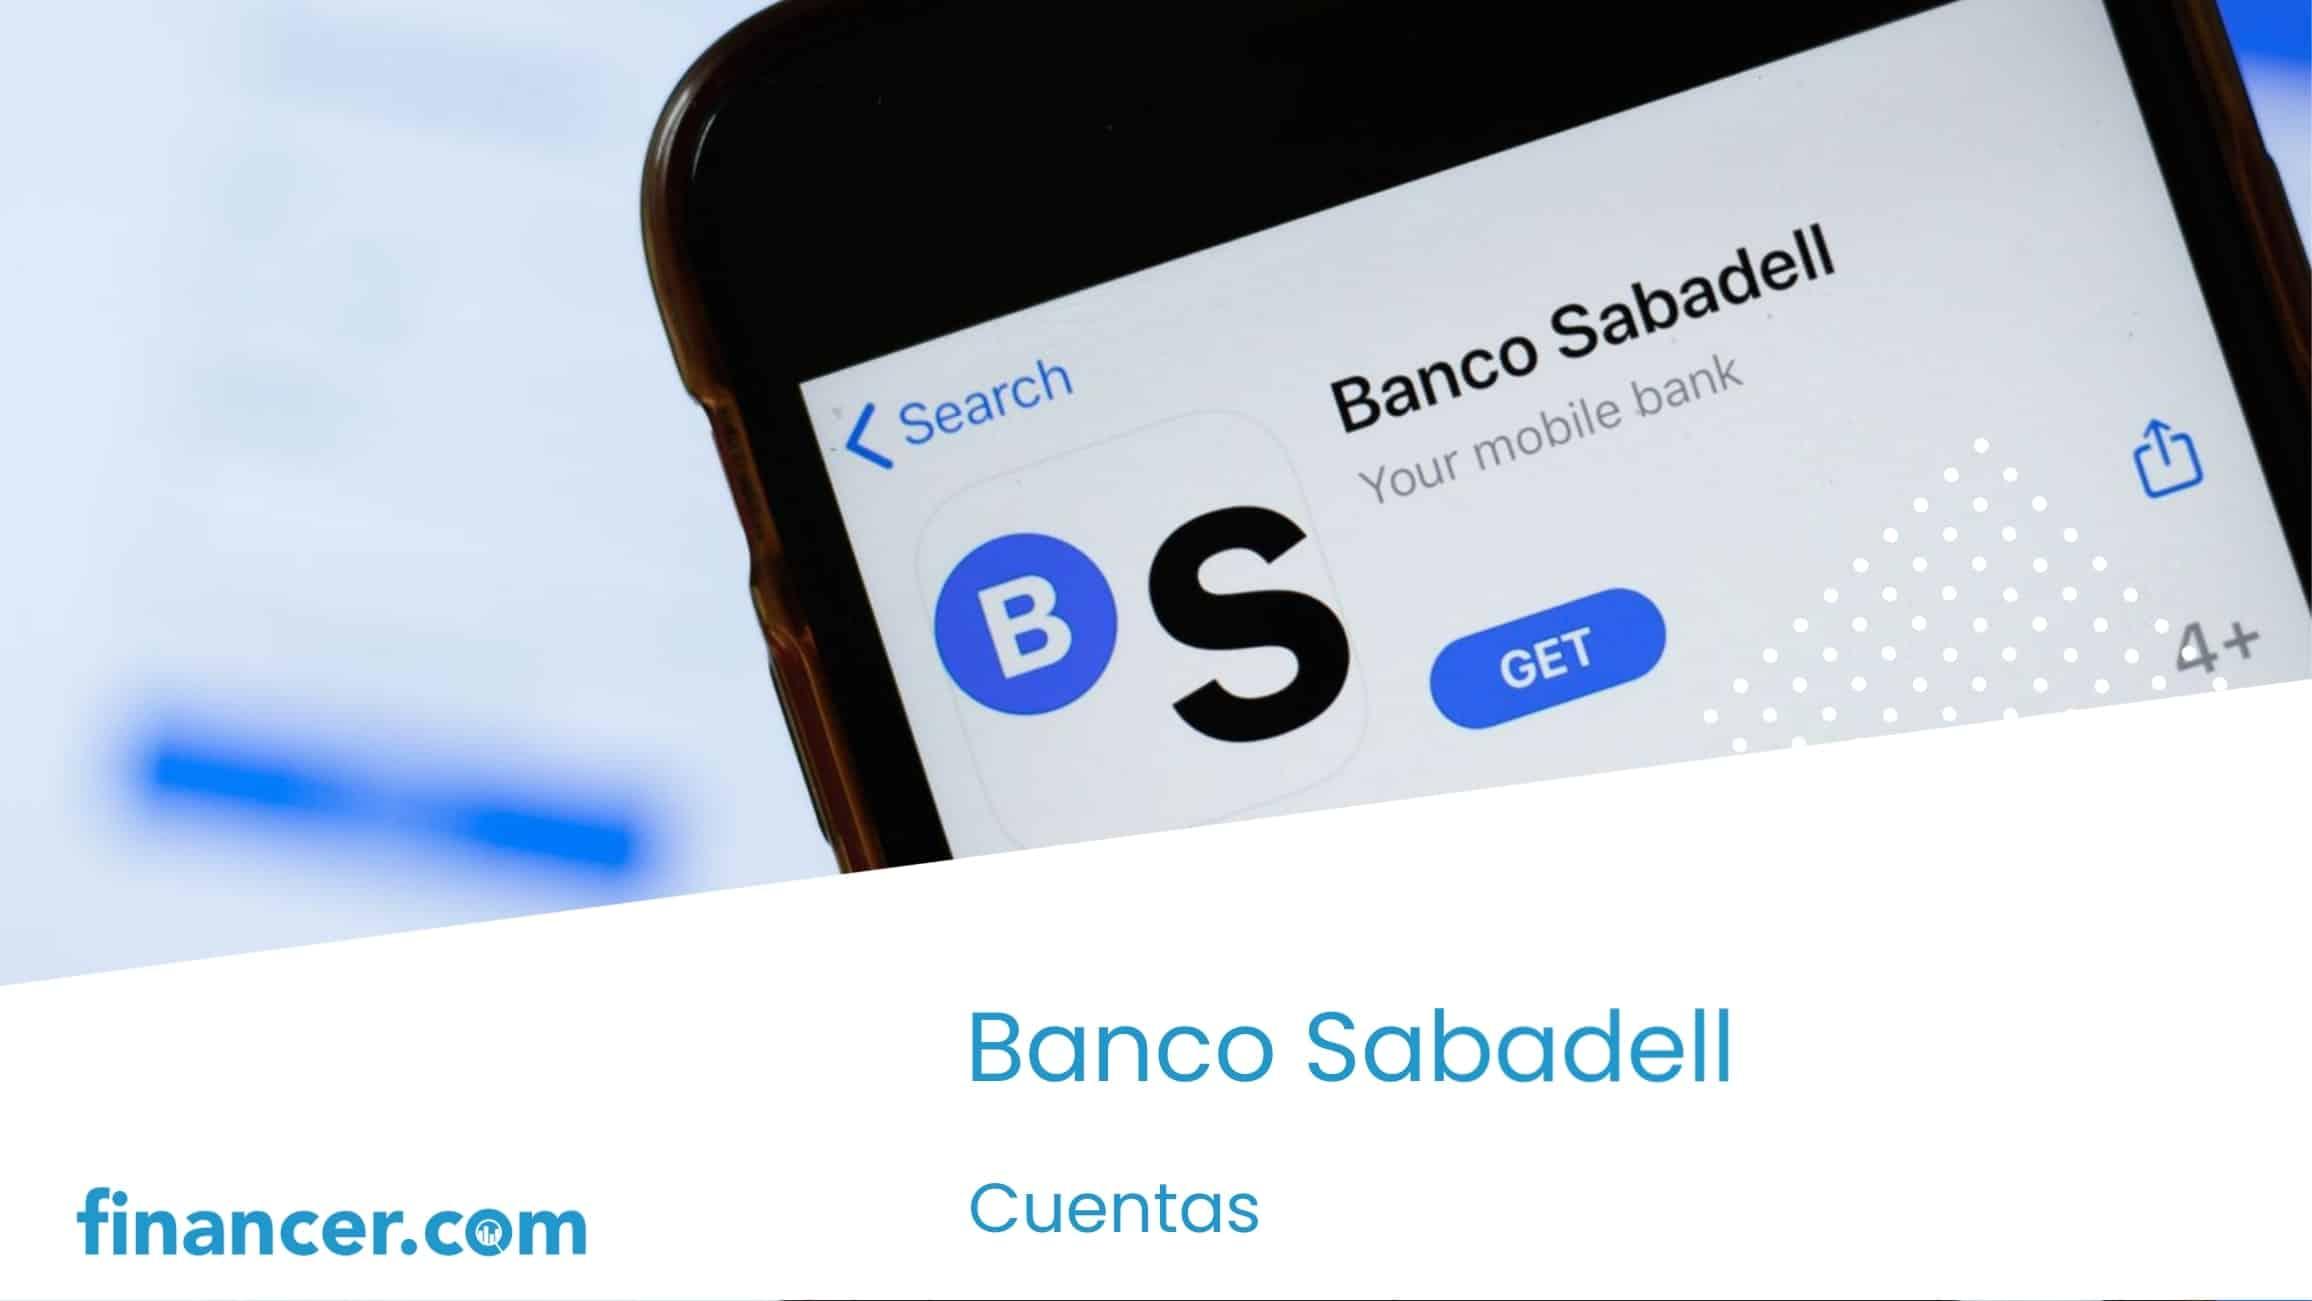 banco sabadell Cuenta expansion